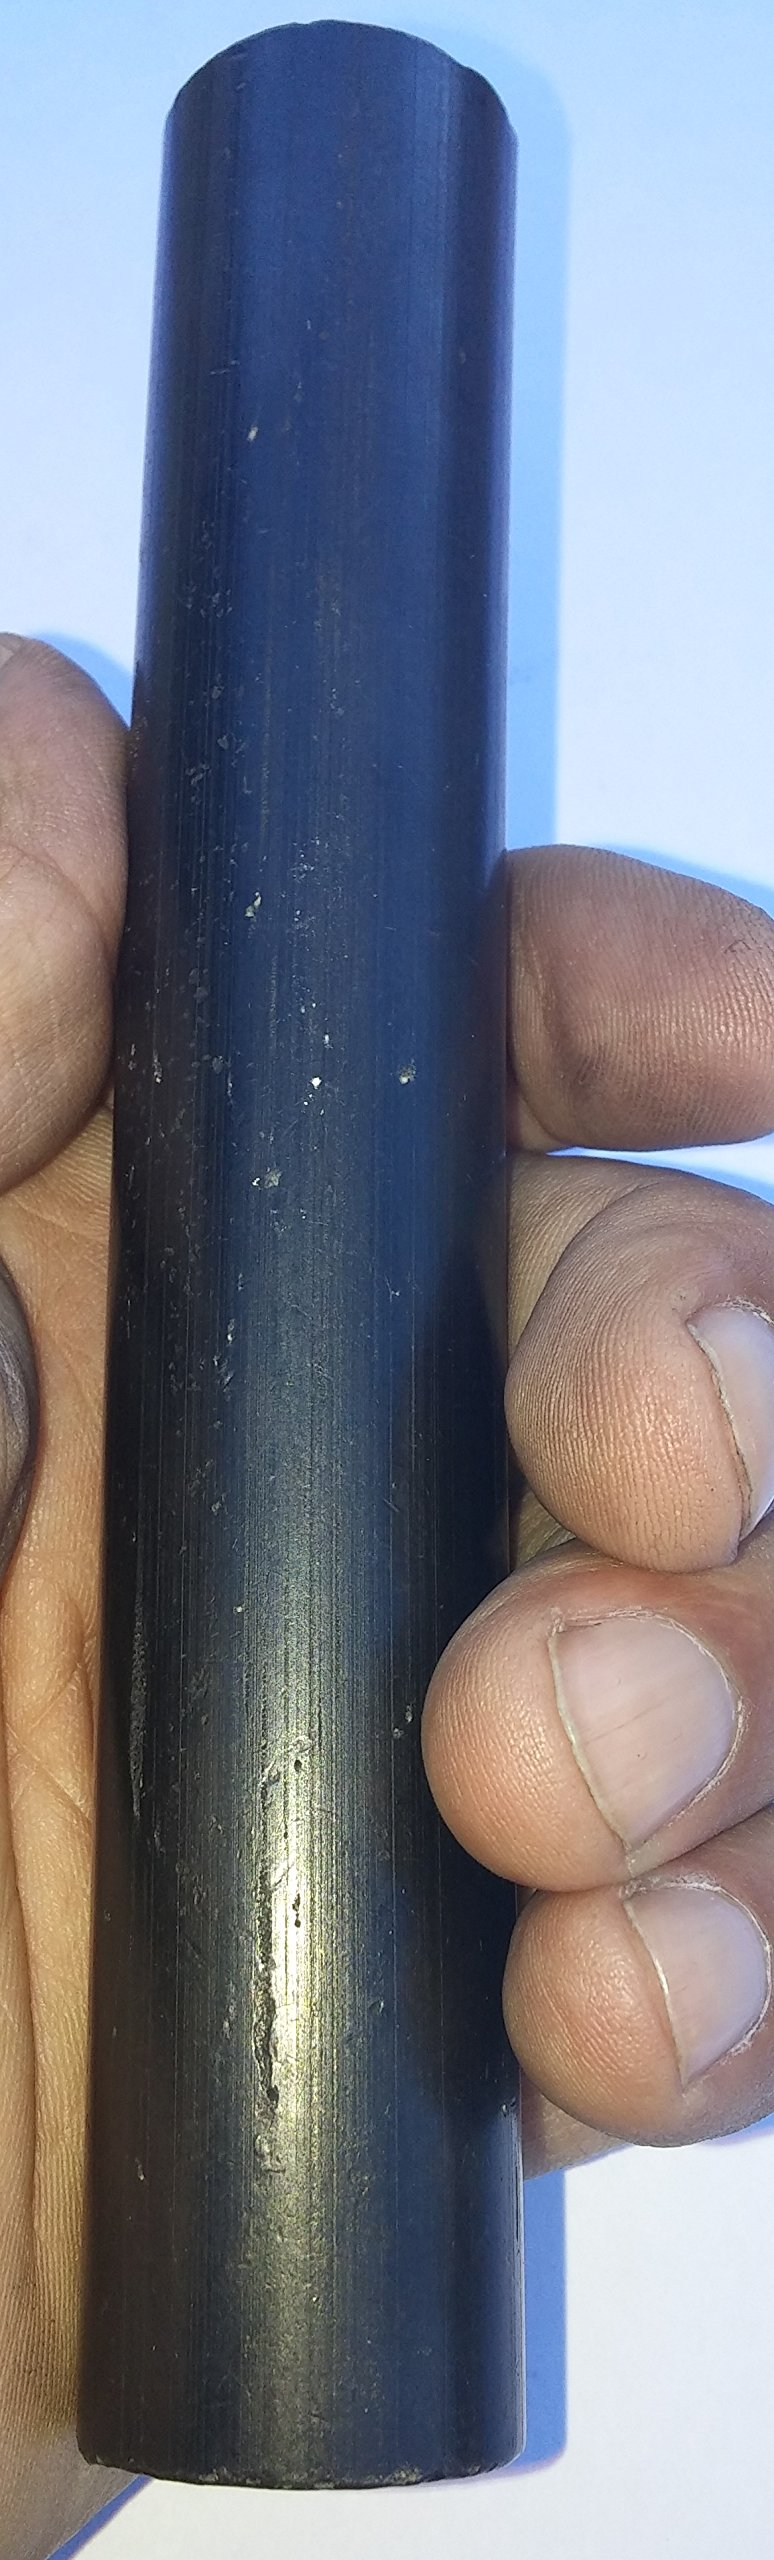 Magnum XL. One inch diameter, six inches long. Ferro rod. Ferrocerium rod. firesteel. fire starter.